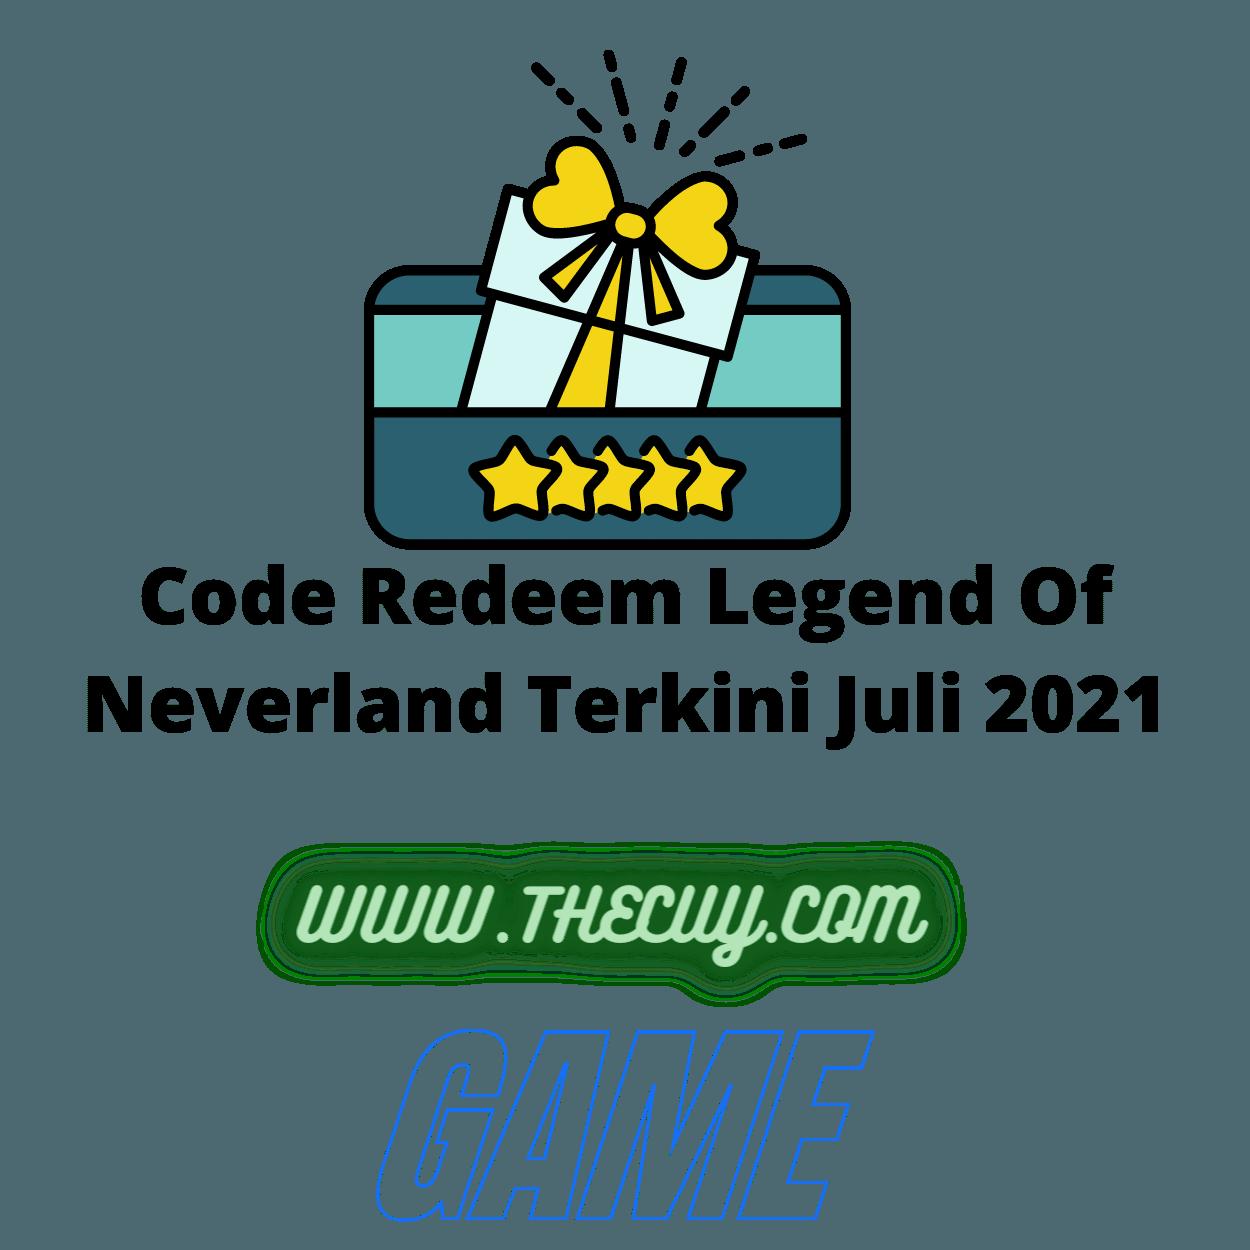 Code Redeem Legend Of Neverland Terkini Juli 2021